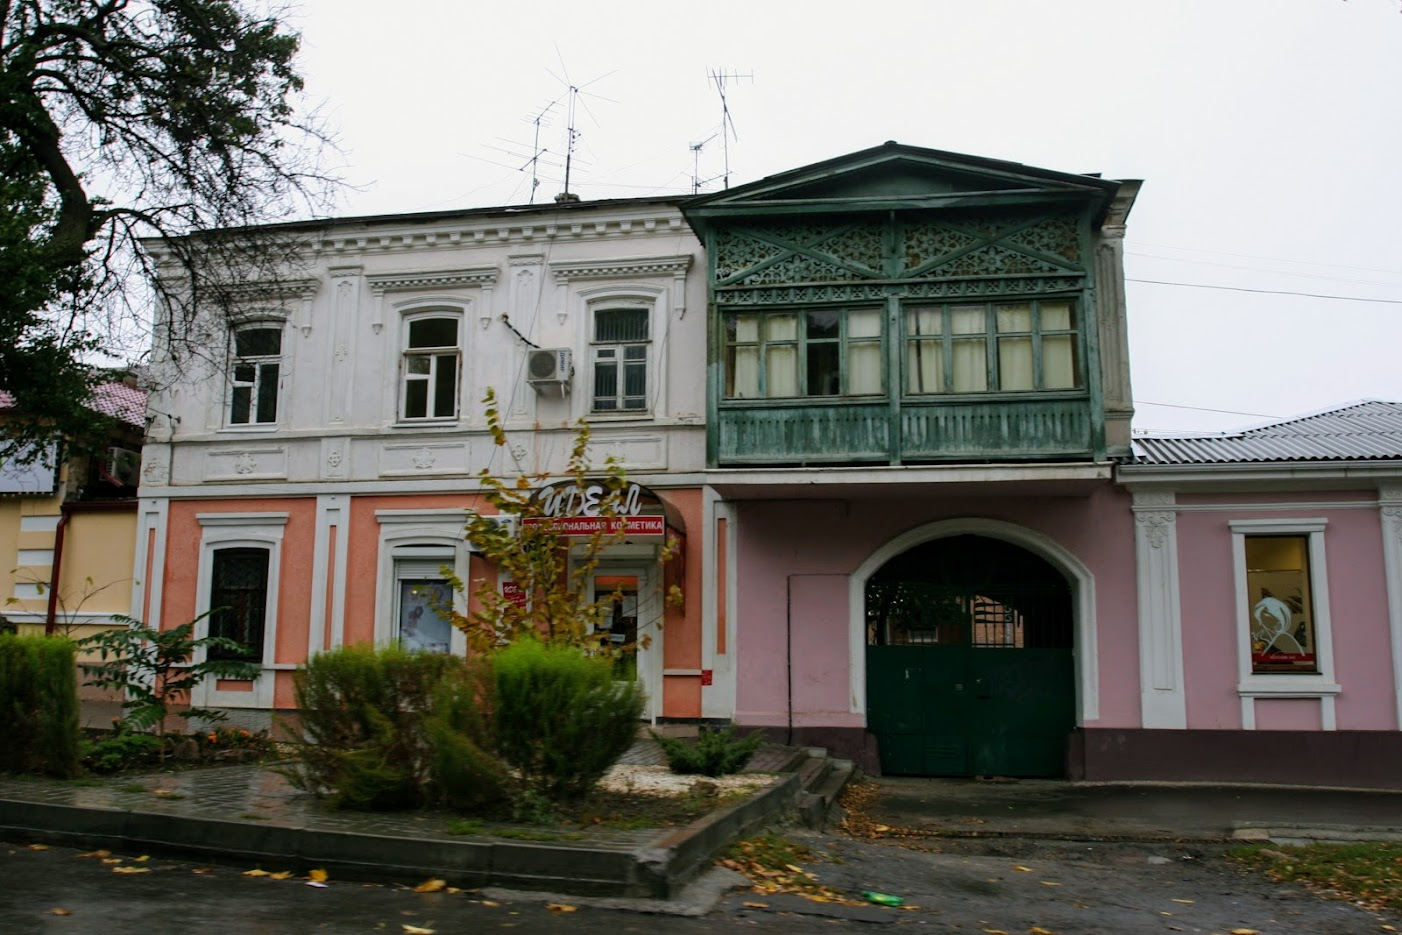 https://sites.google.com/site/istoriceskijtaganrog/kampengauzenskij-pereulok/dom-s-6